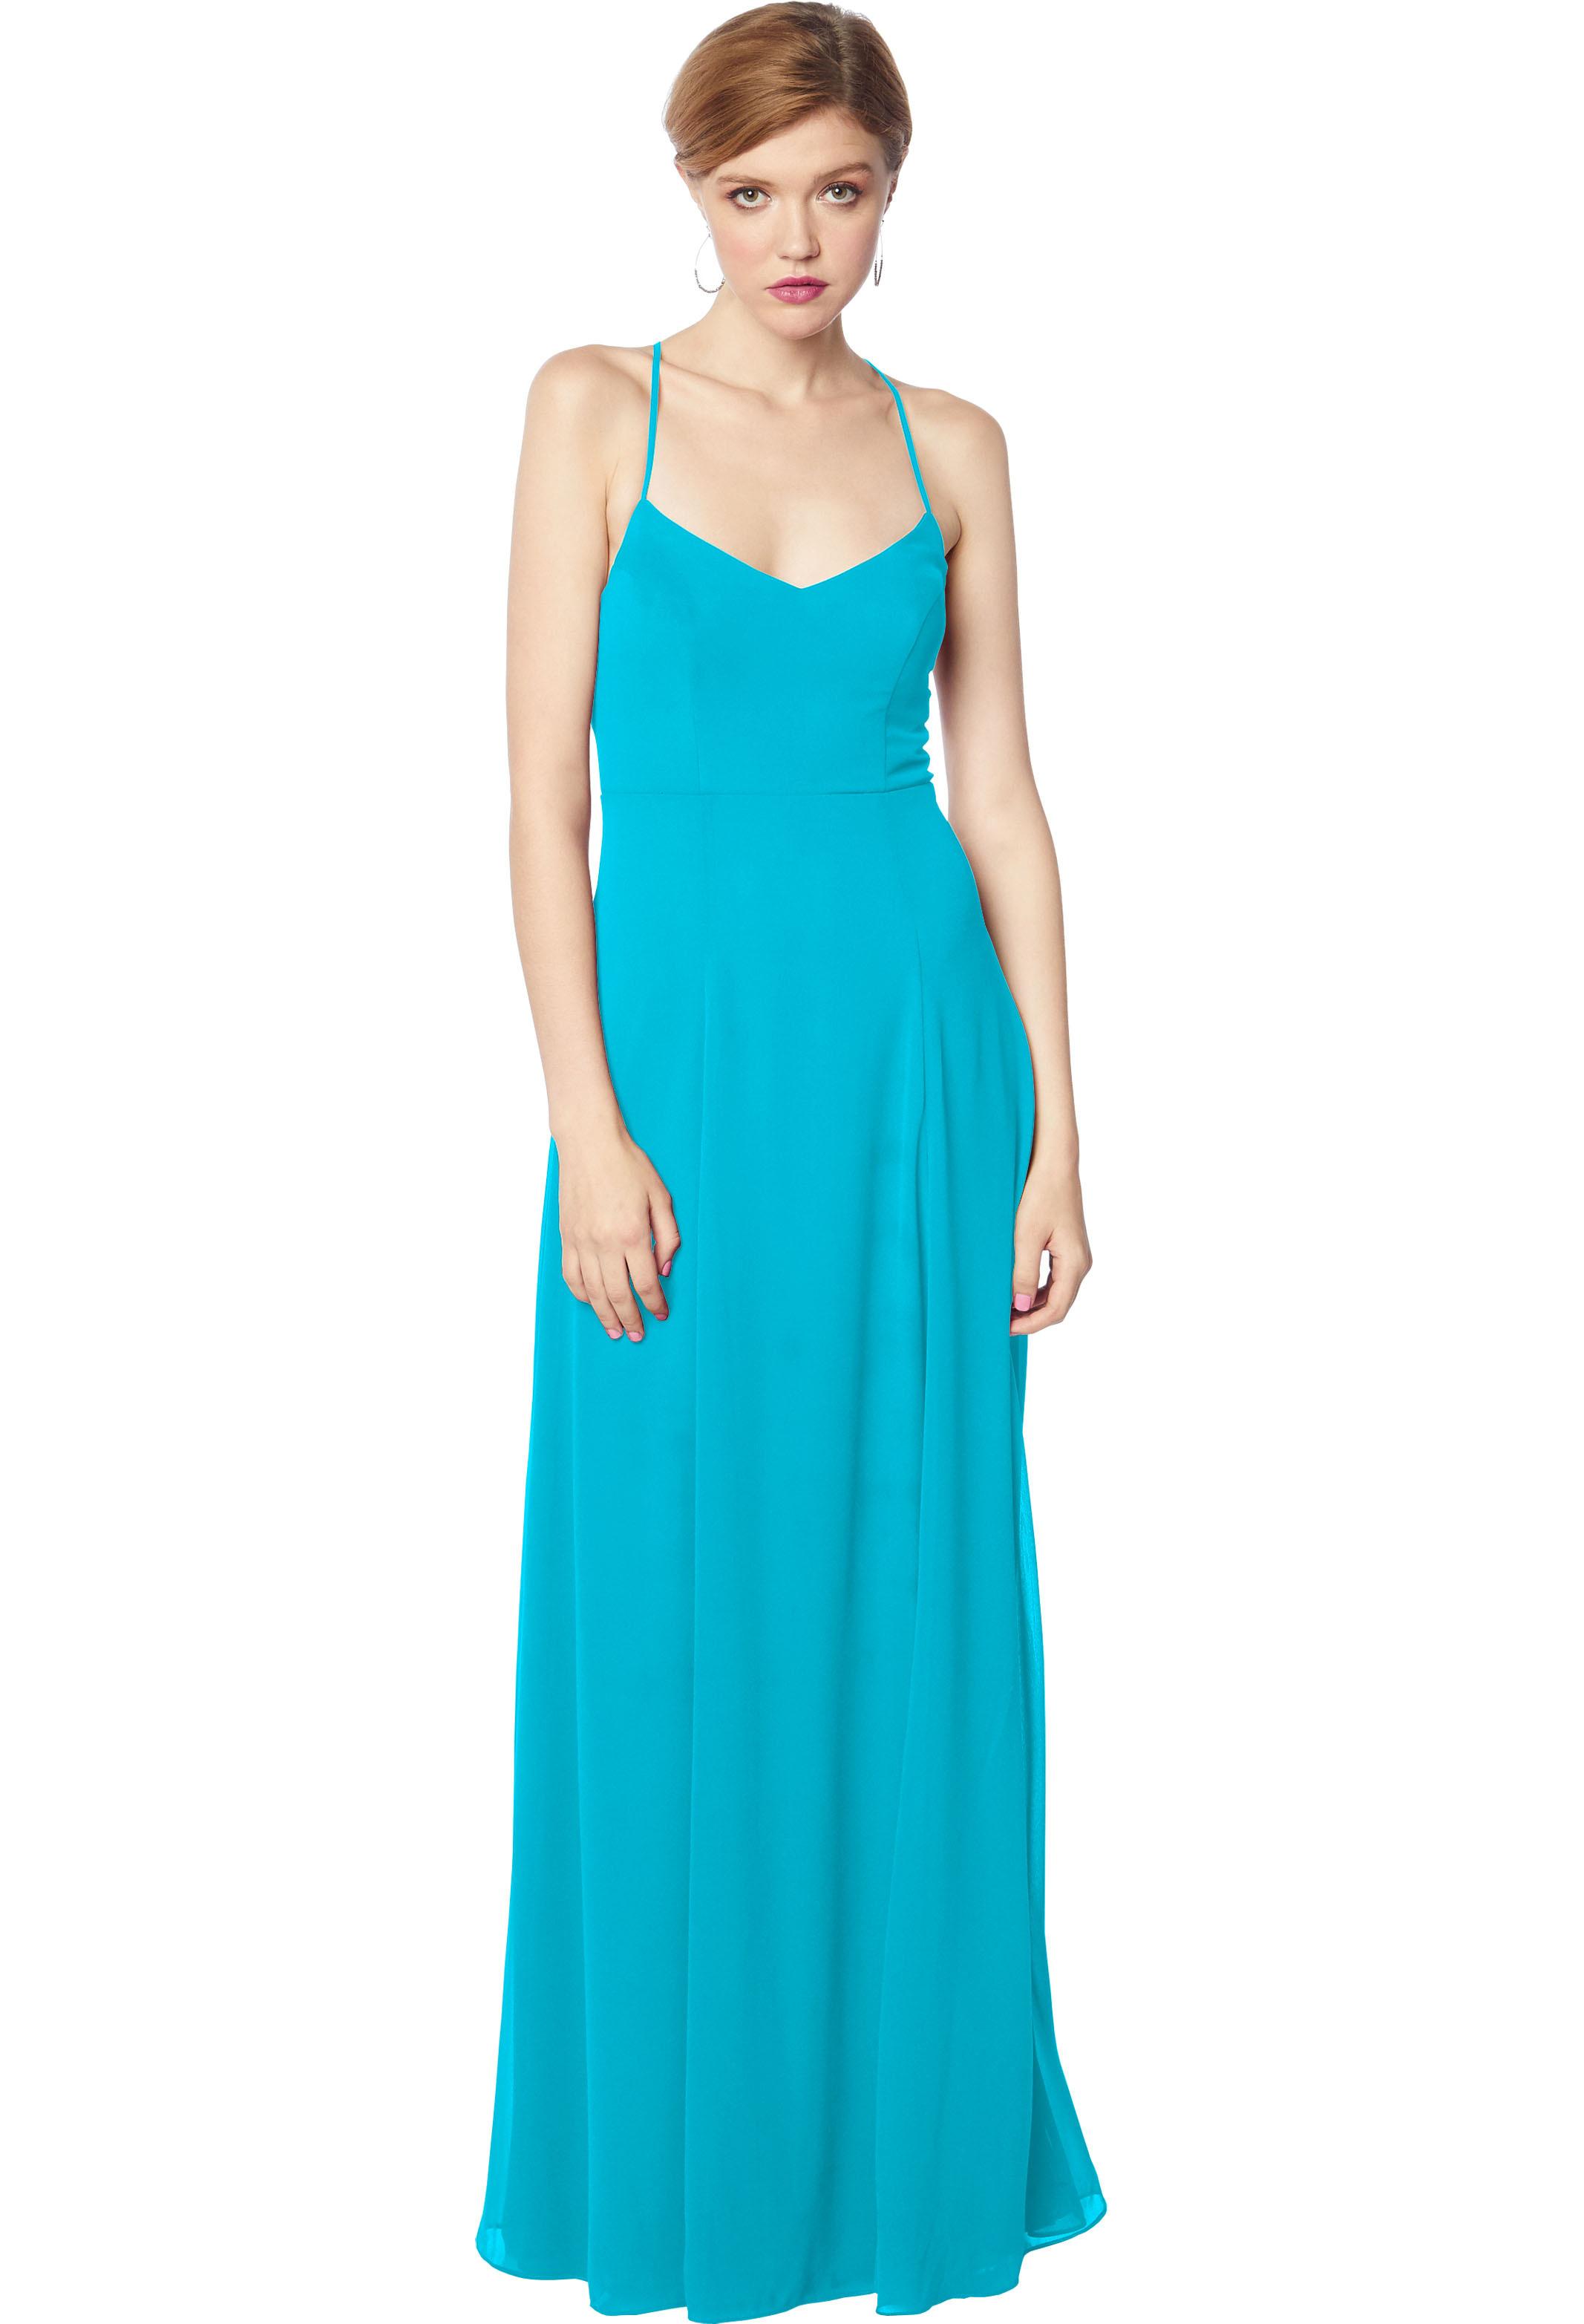 Bill Levkoff OASIS Chiffon V-neck Natural Waist gown, $170.00 Front